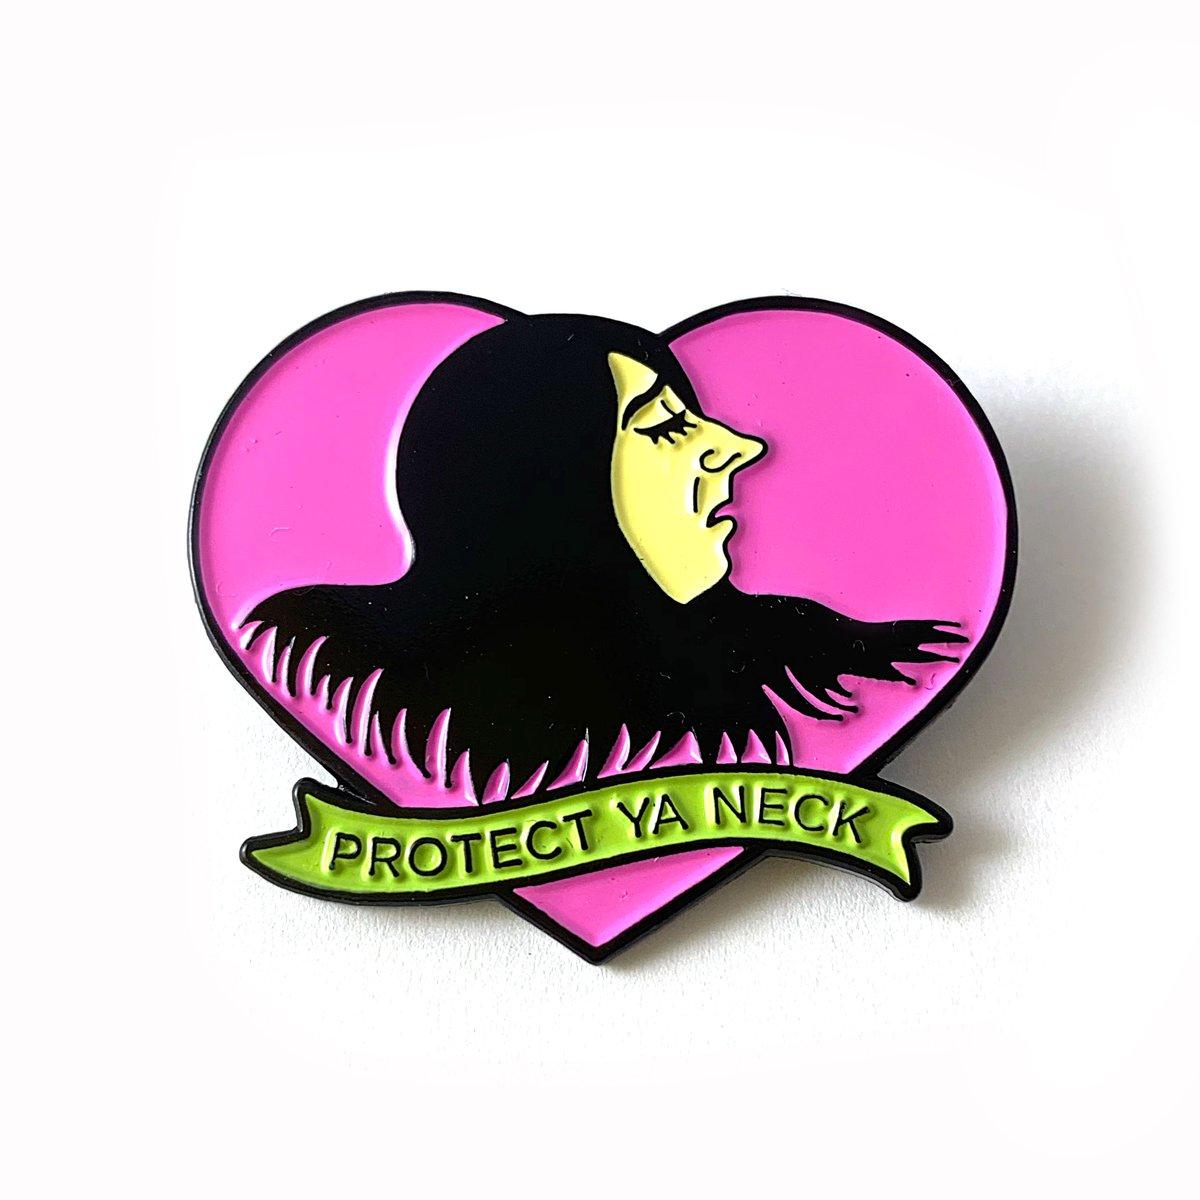 Image of Protect Ya Neck Enamel Pin